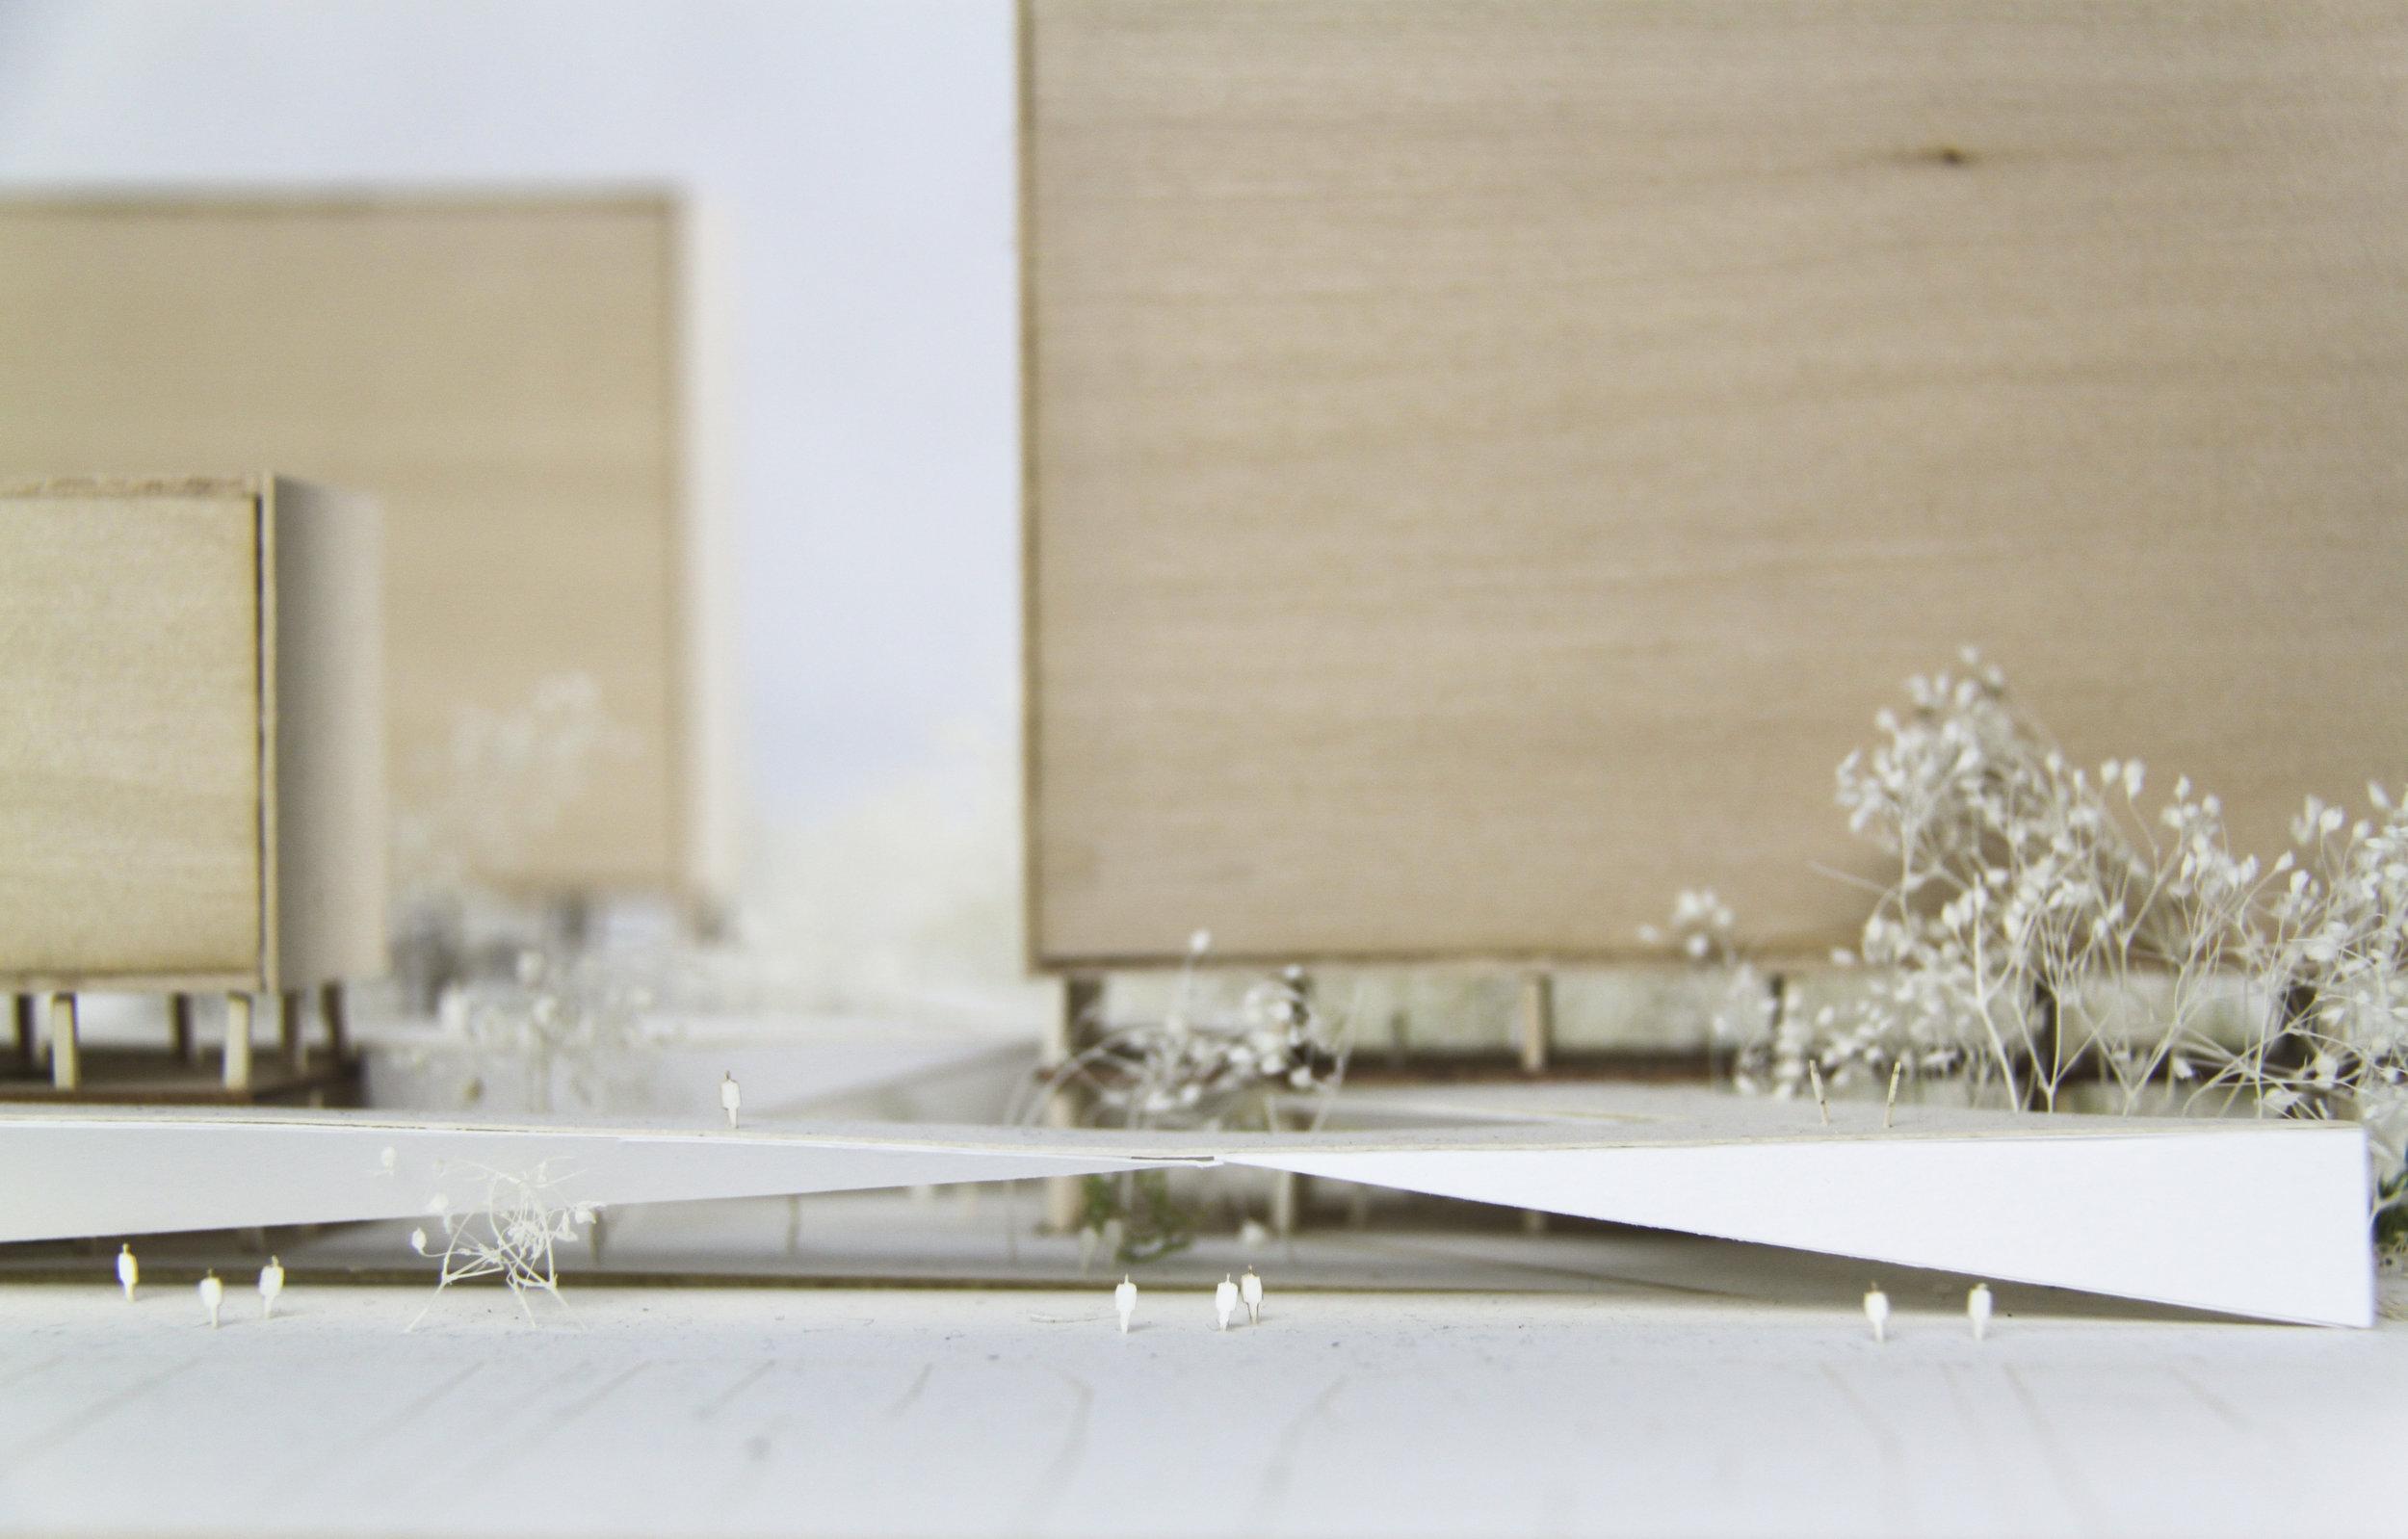 Concurso/Concourse, model from Hilary Sample's studio.